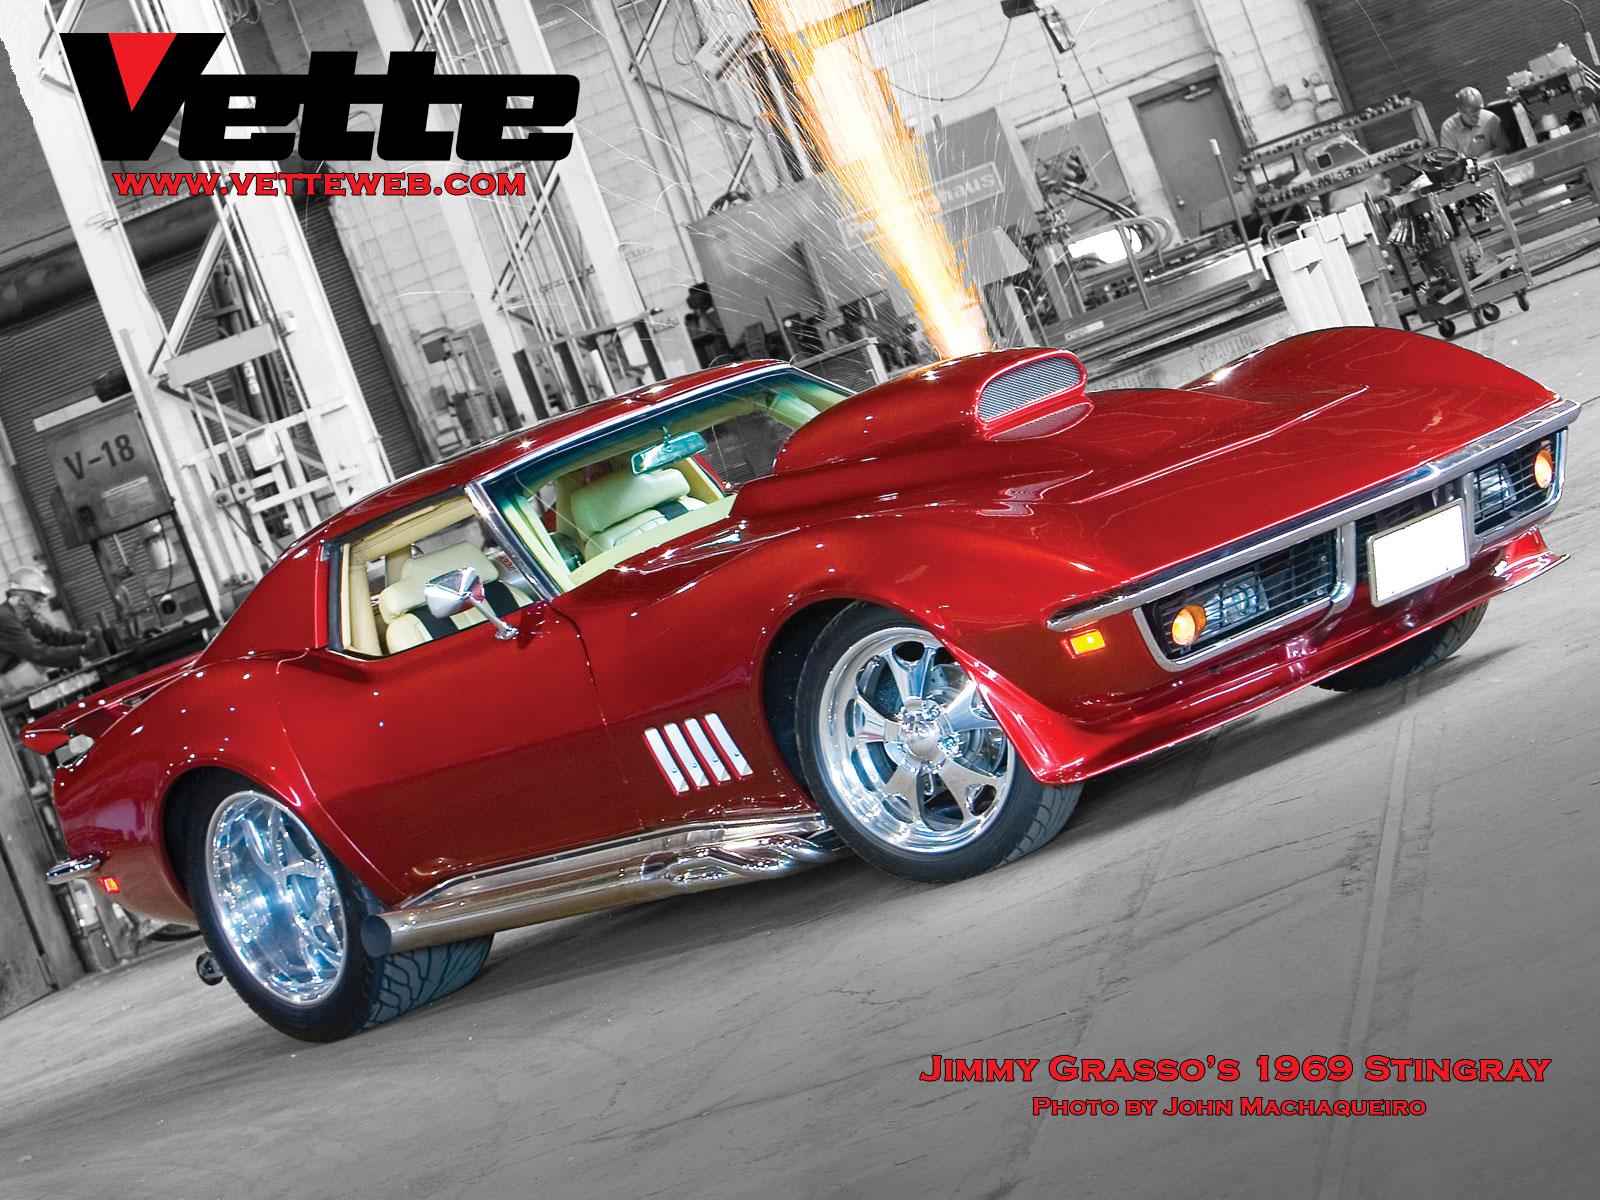 corvette c3 wallpaper wallpapersafari - Corvette Stingray 1969 Wallpaper